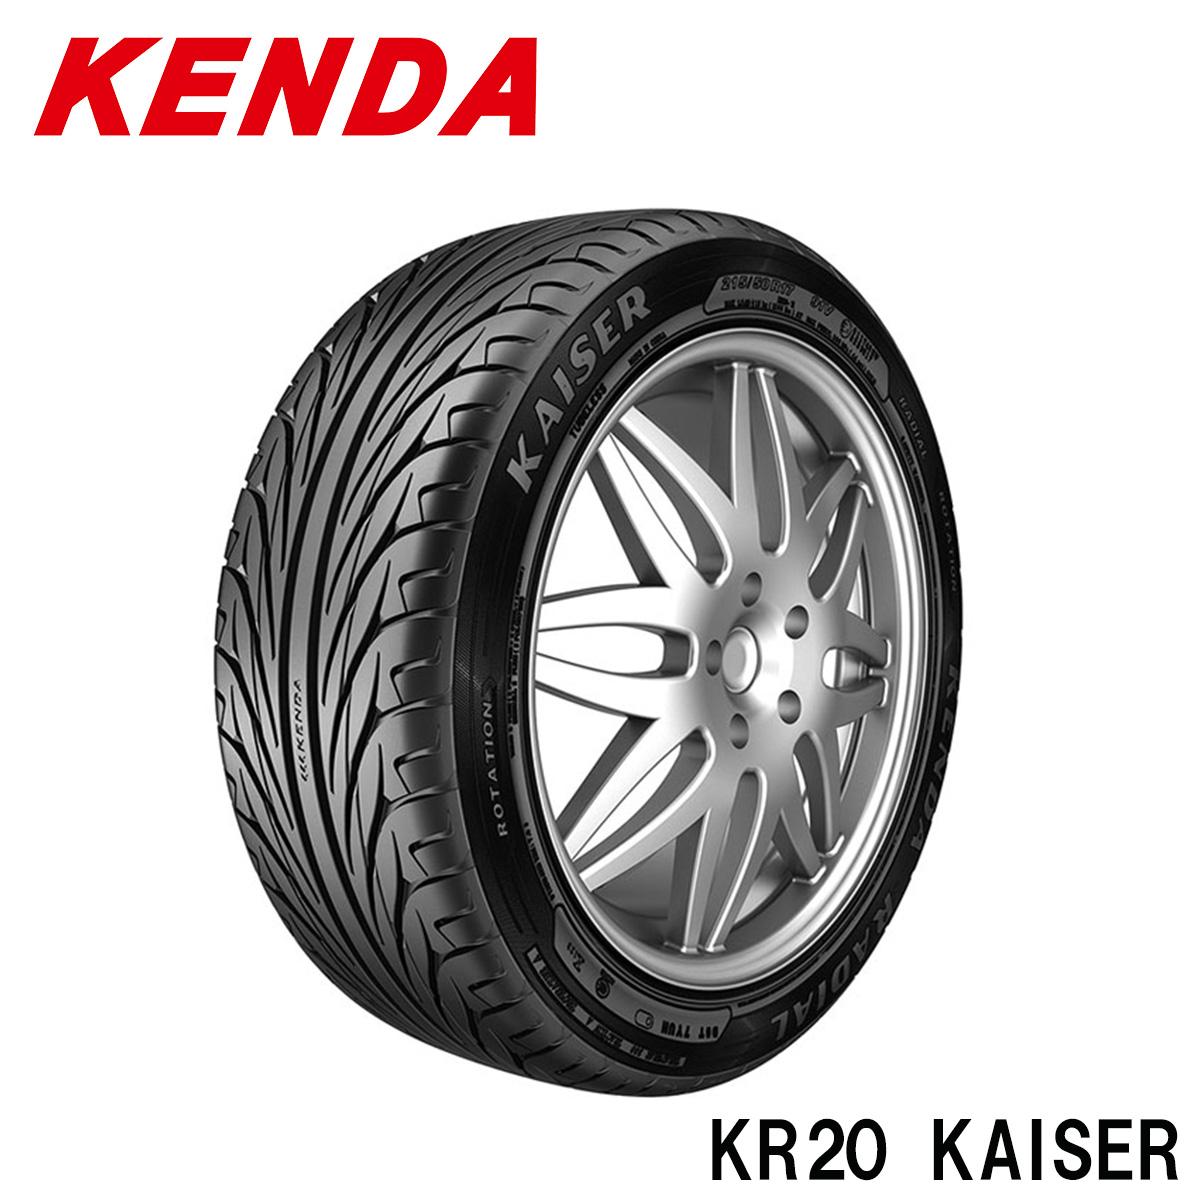 KENDA ケンダ サマータイヤ 1本 18インチ 255/35R18 カイザー KAISER KR20